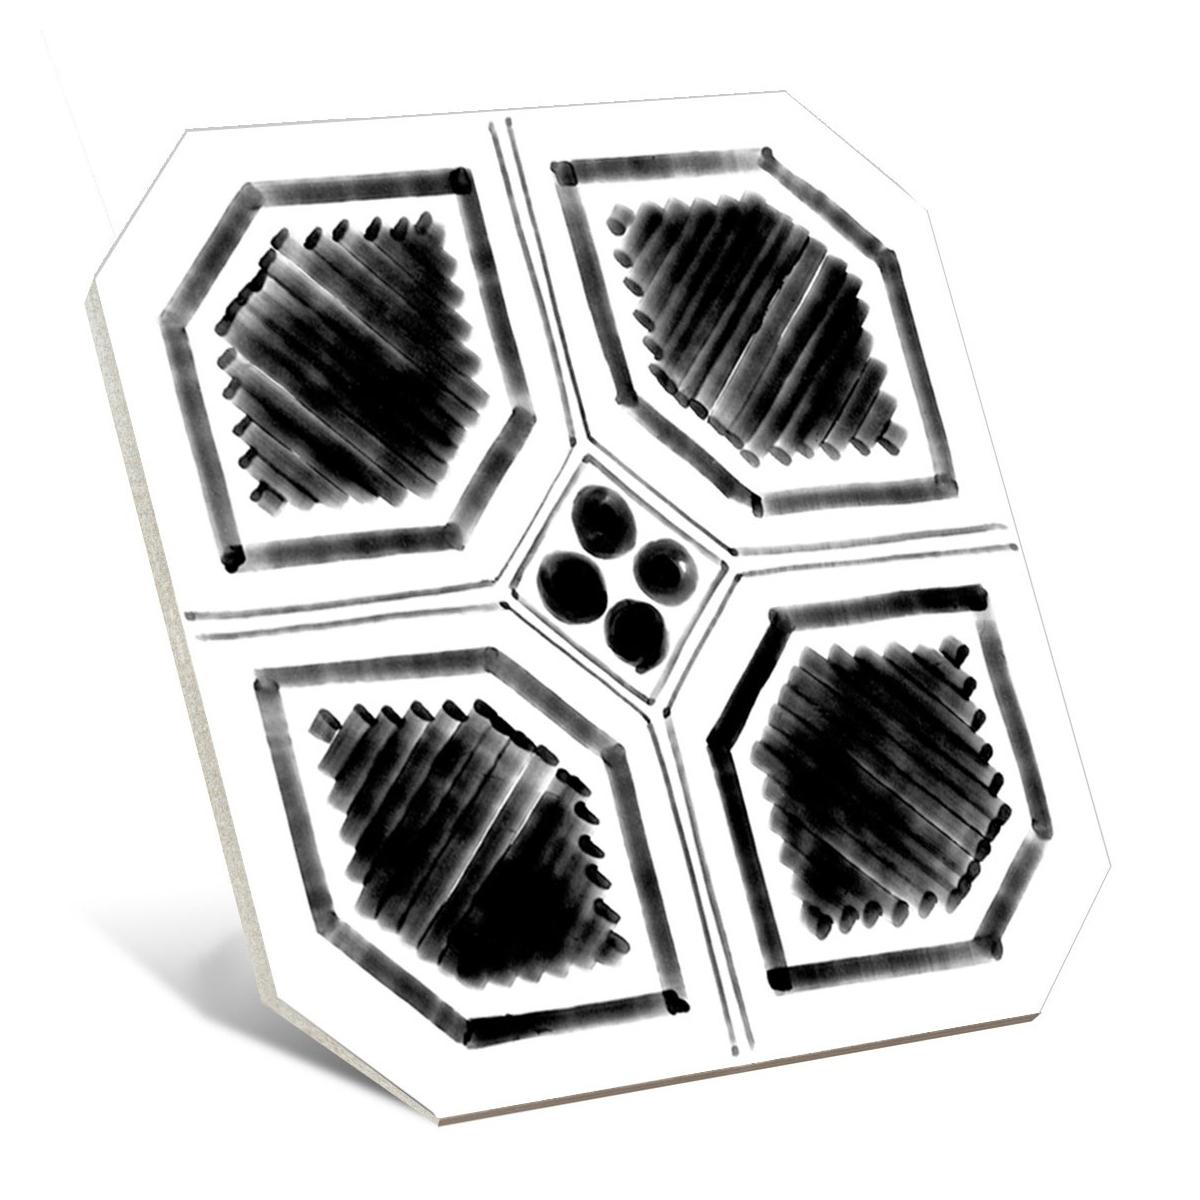 Octógono Variette Sombra 20x20